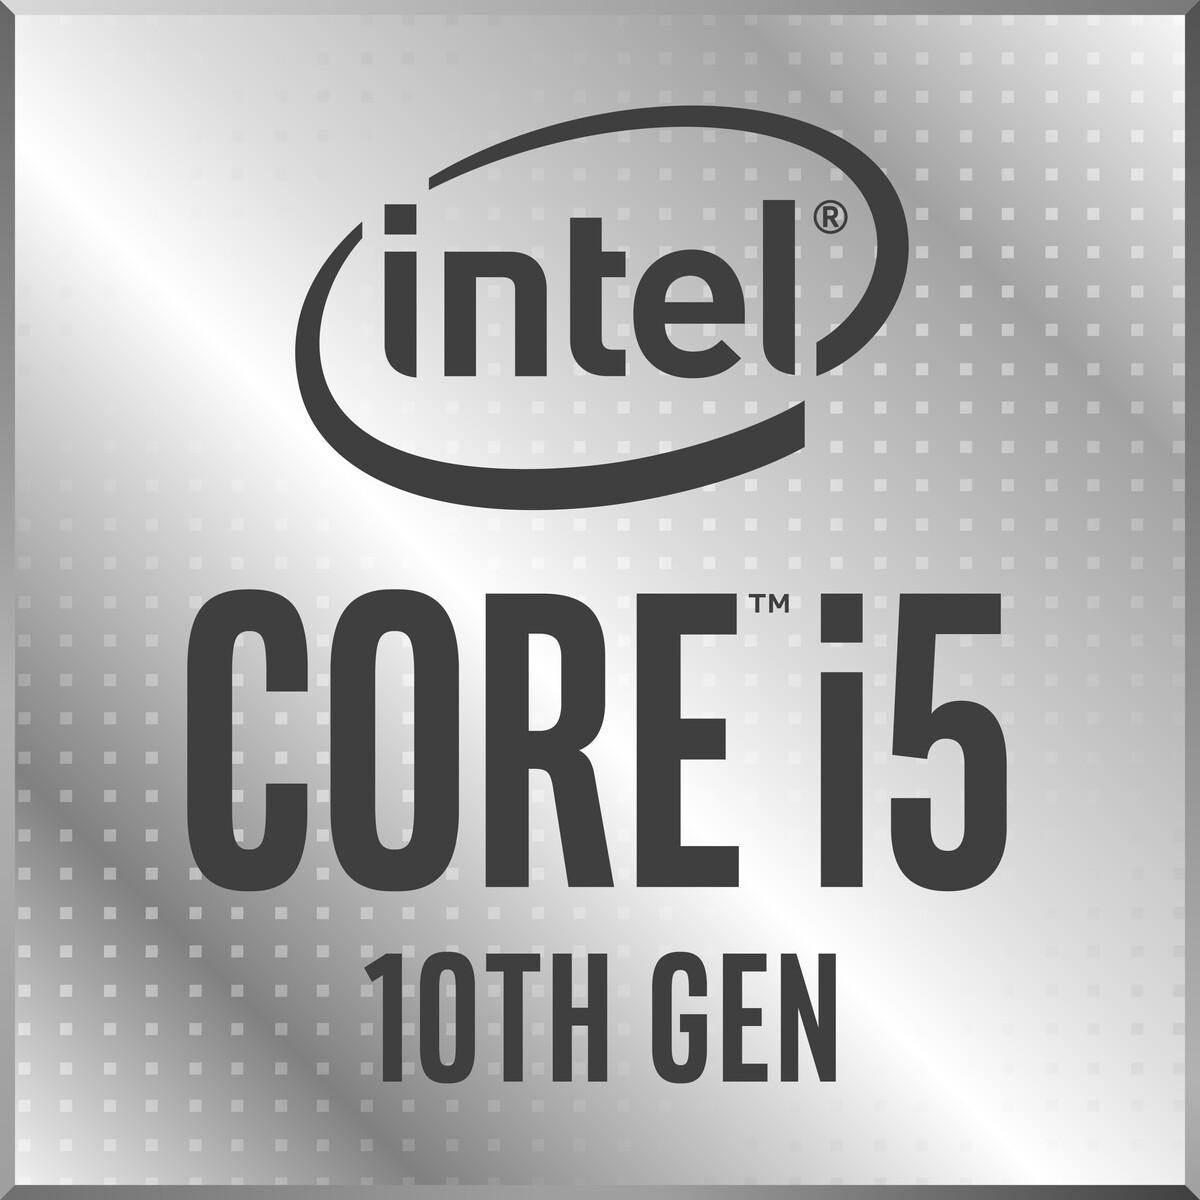 Intel Core i5-1035G7 Laptop Processor (Ice Lake